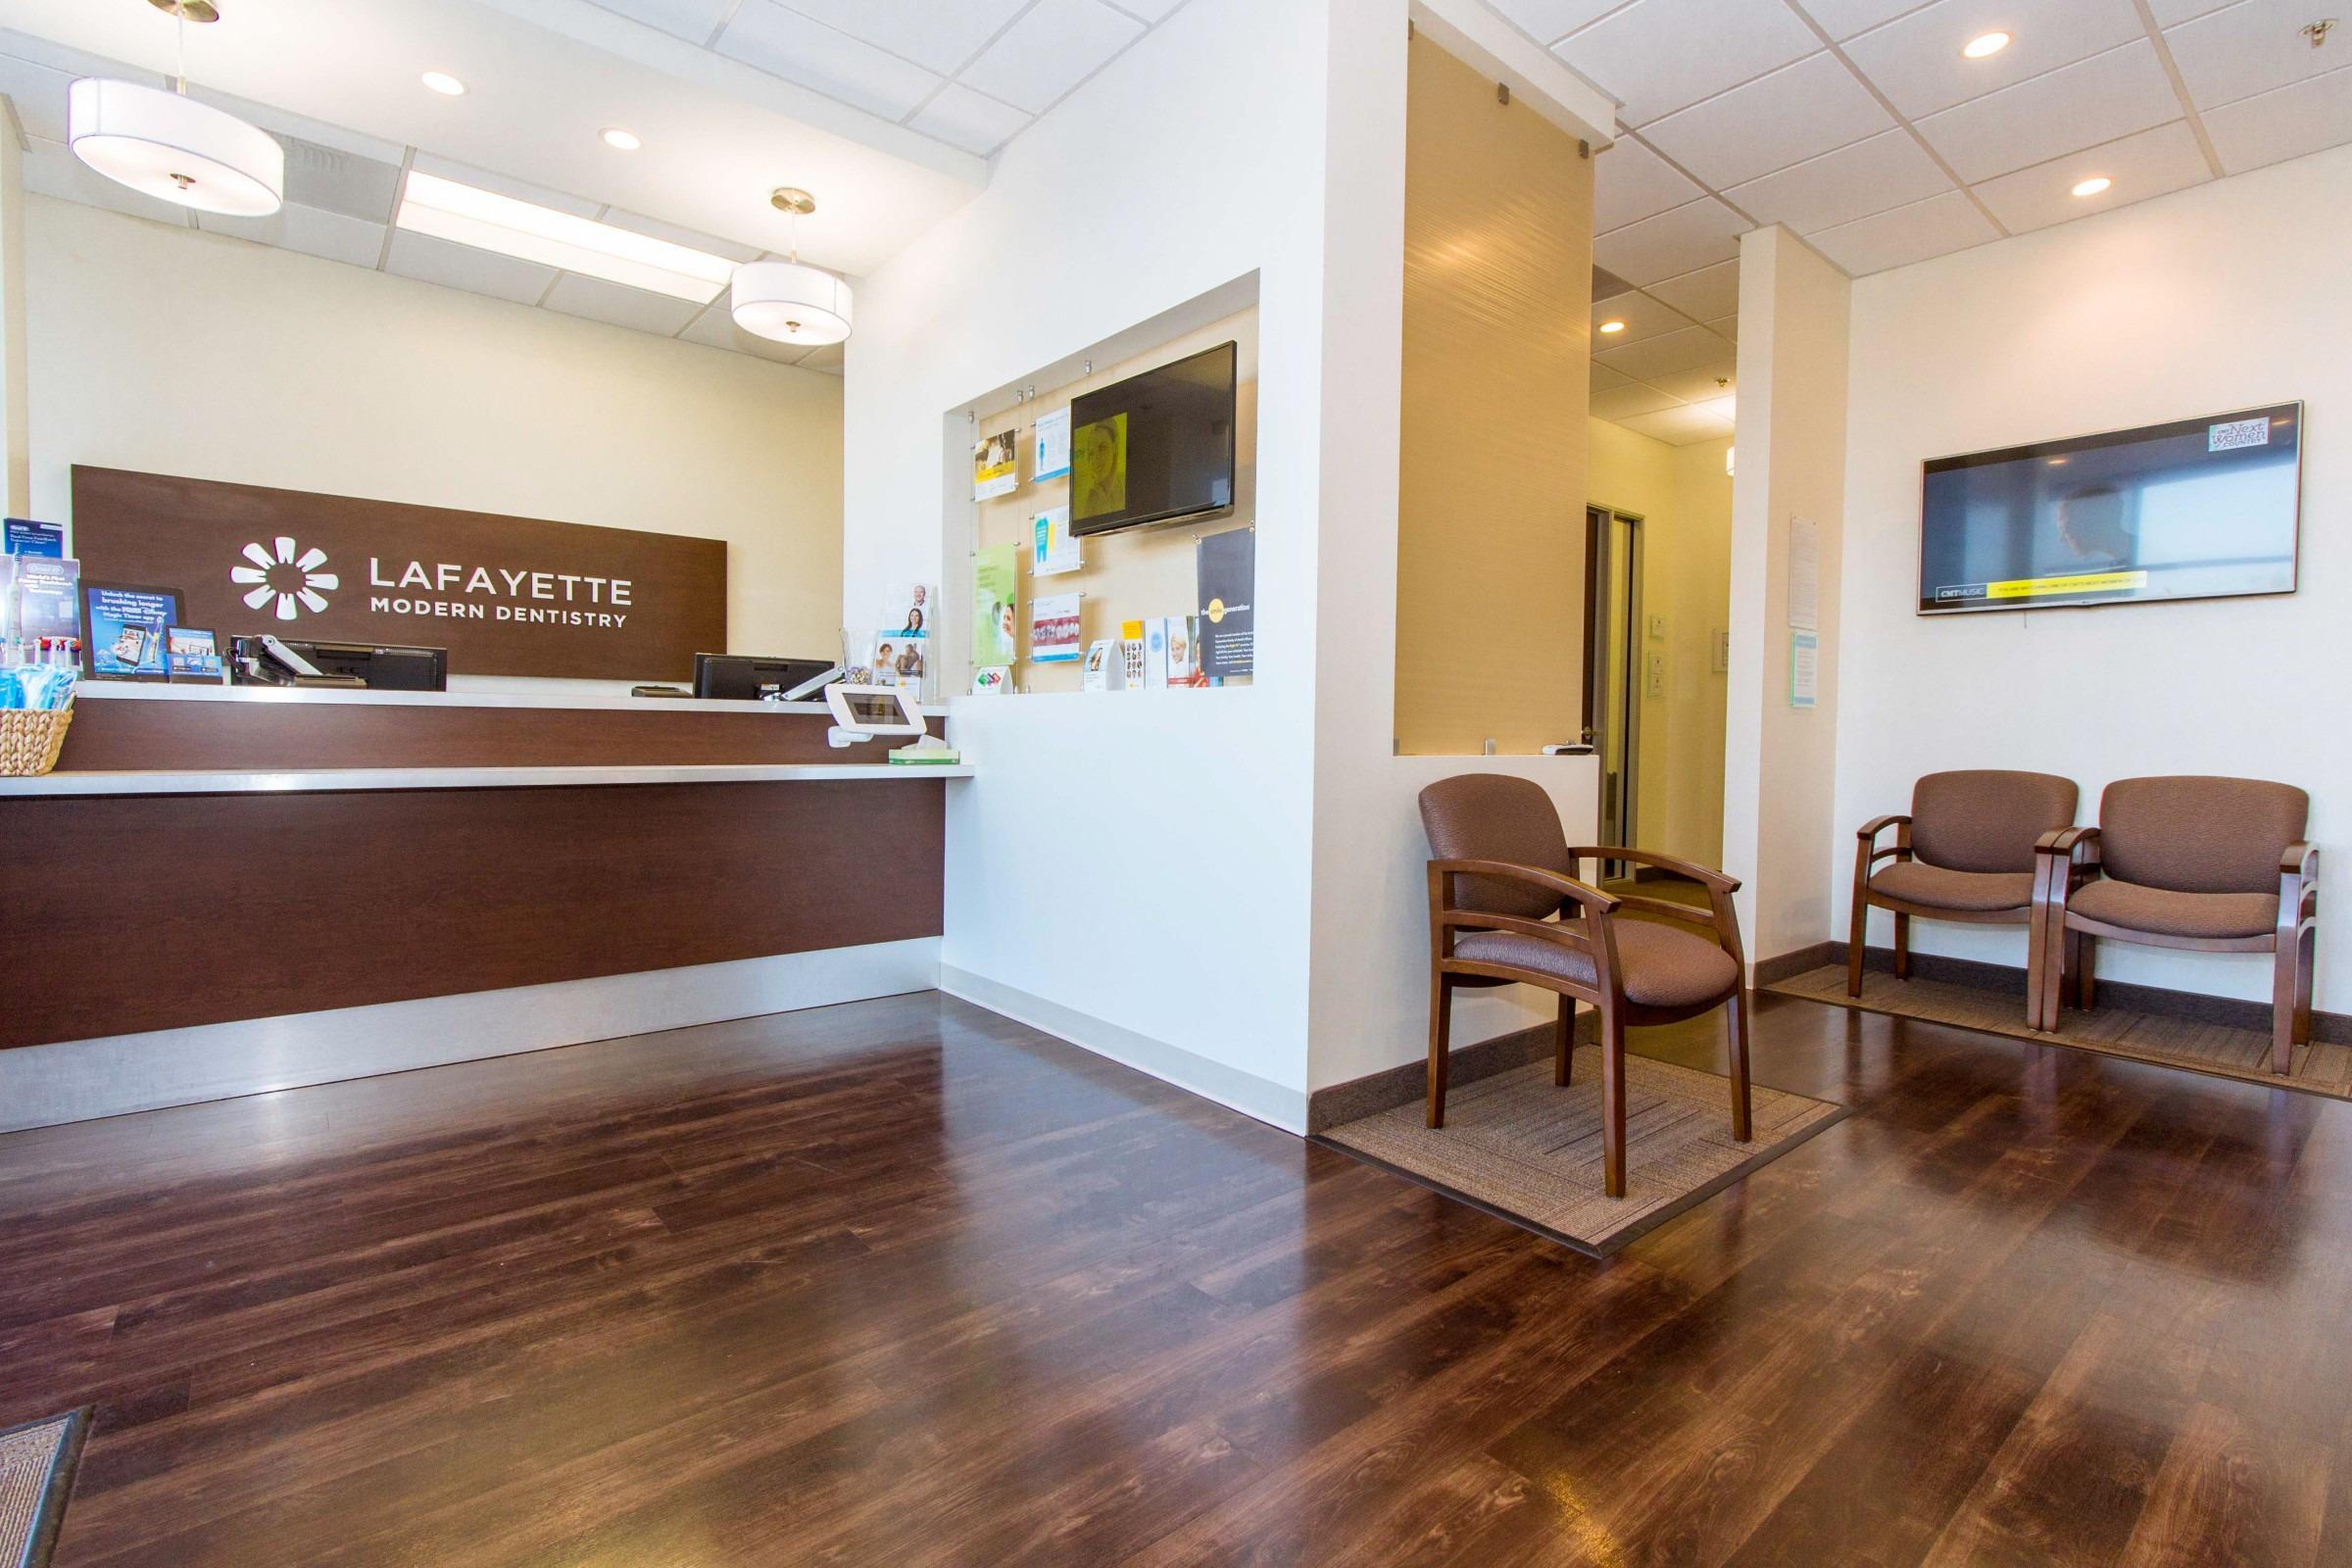 Lafayette Modern Dentistry image 1